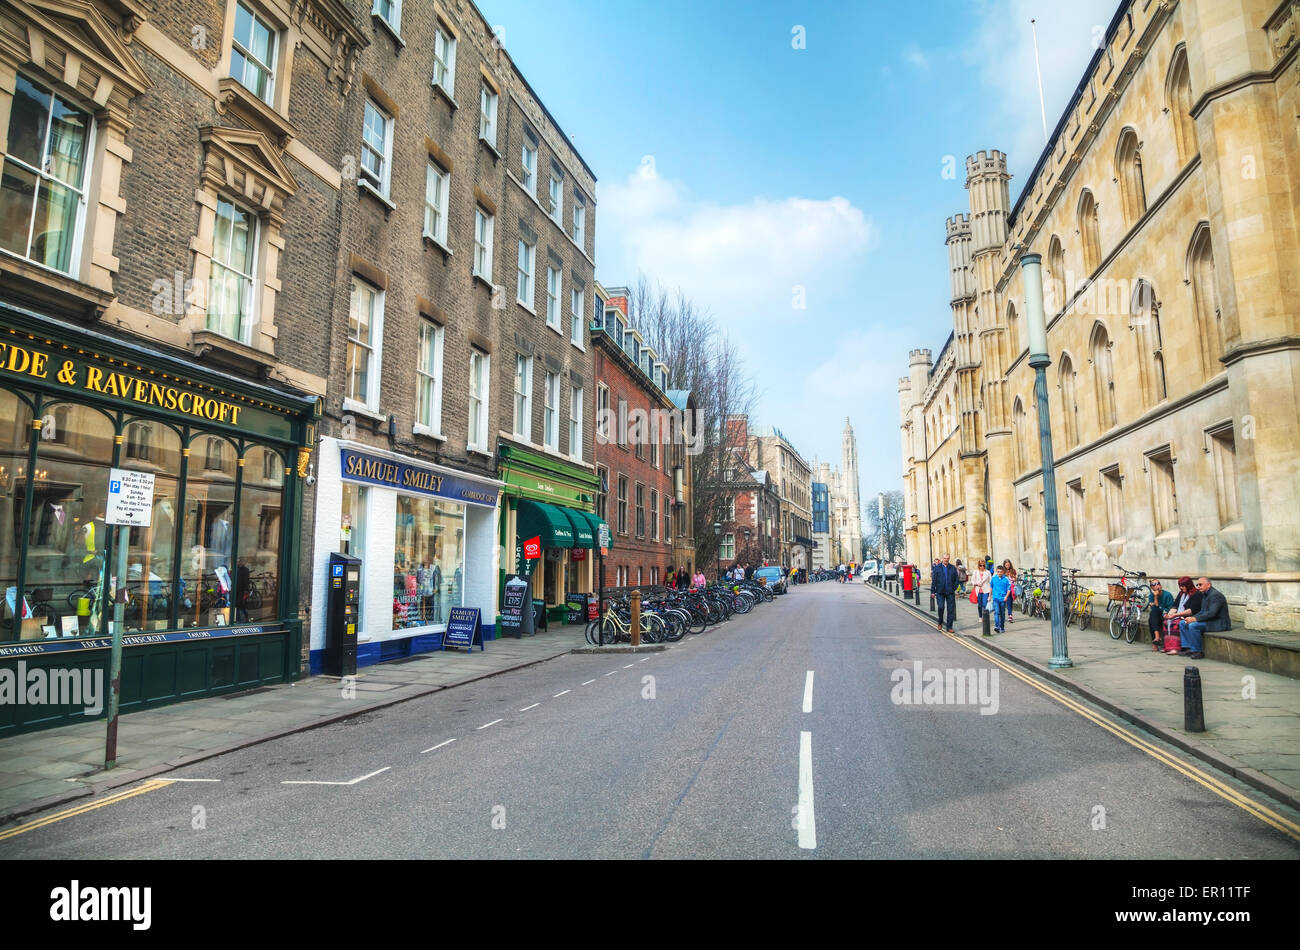 Cambridge, UK - April 9: Old King's Parade street on April 9, 2015 in Cambridge, UK. It's a university city. - Stock Image